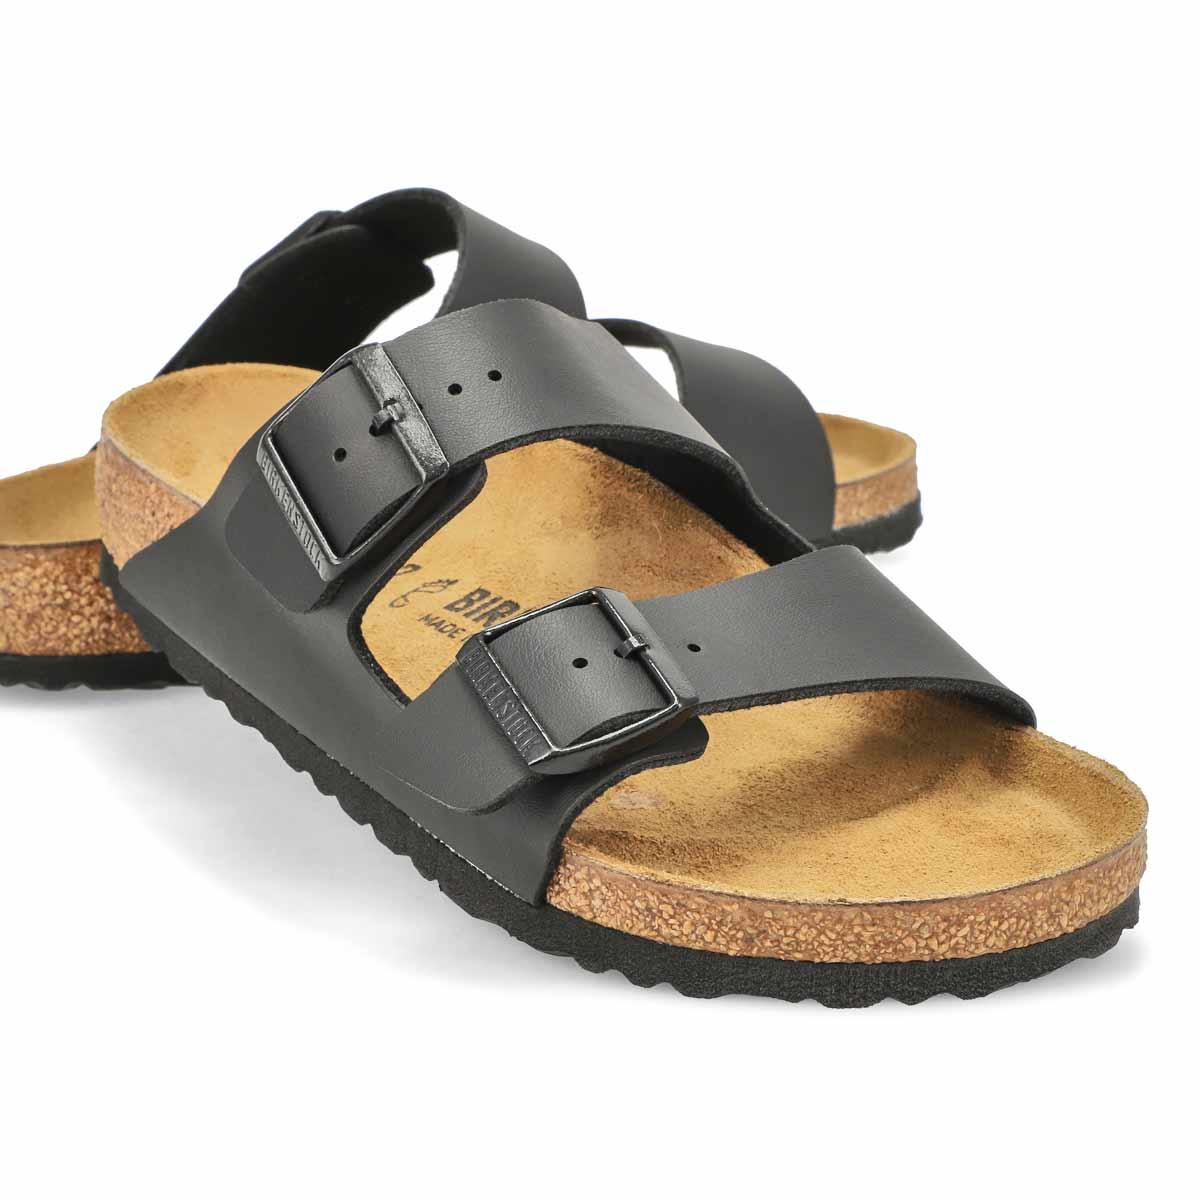 Lds Arizona BF black 2 strap sandal